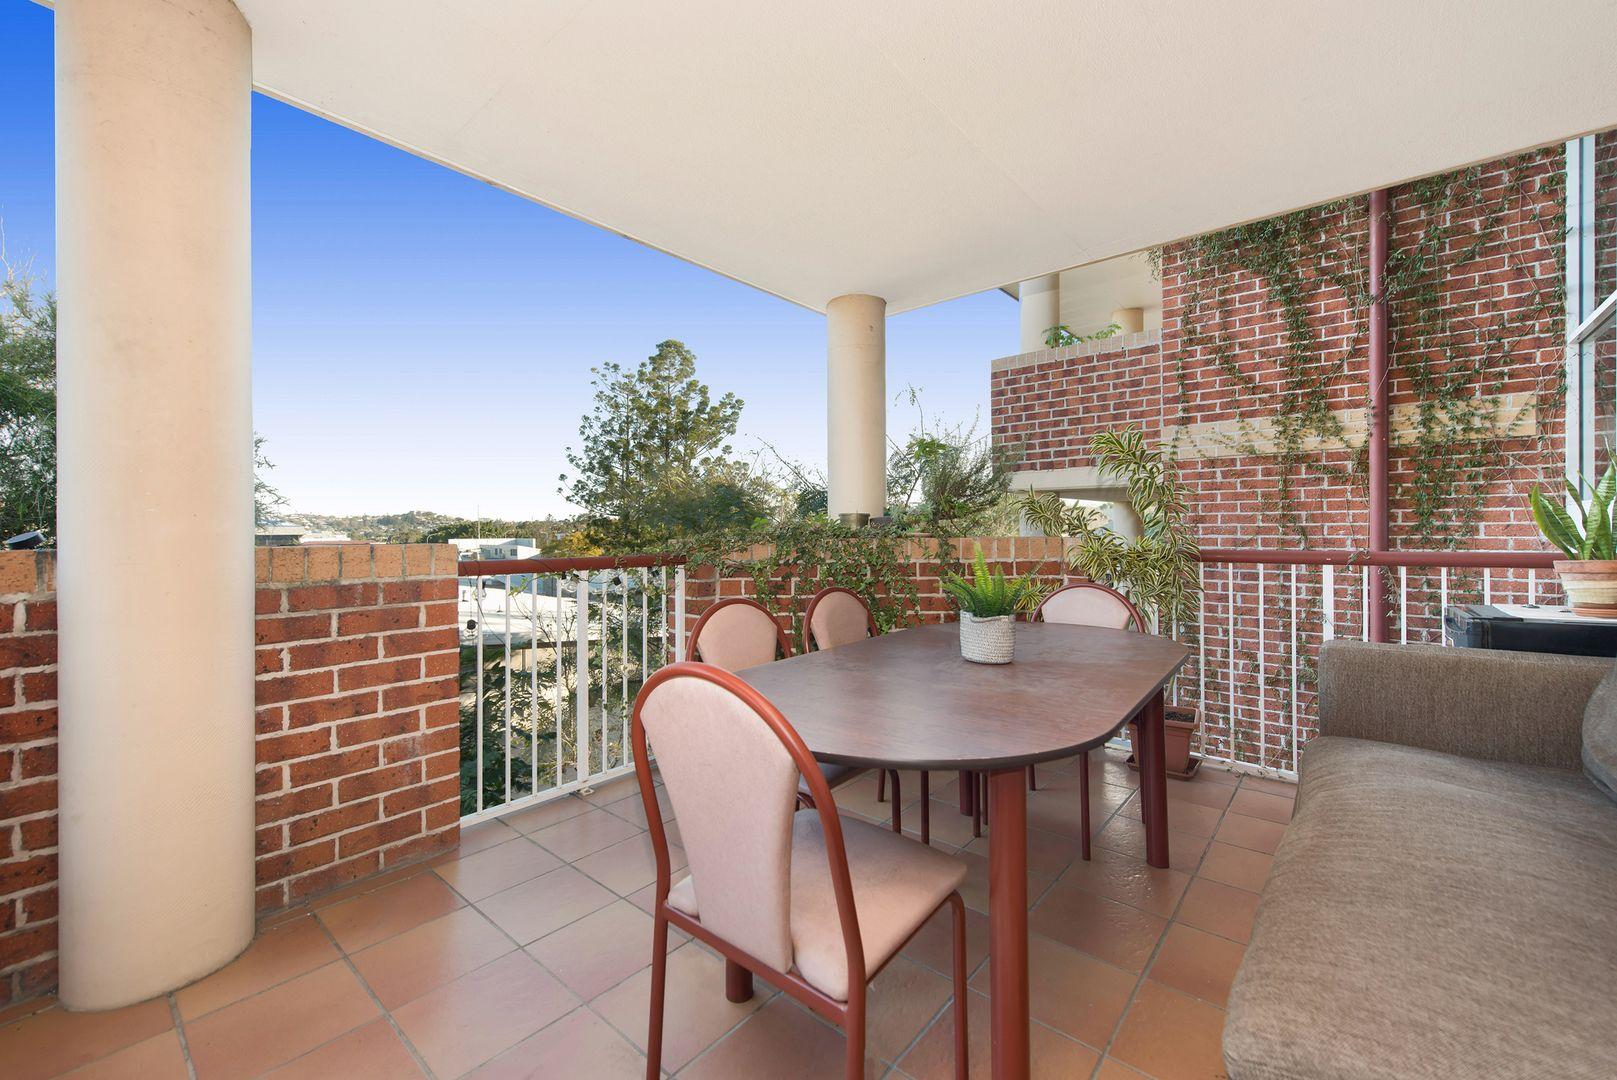 3/15 Wickham Street, Newmarket QLD 4051, Image 2